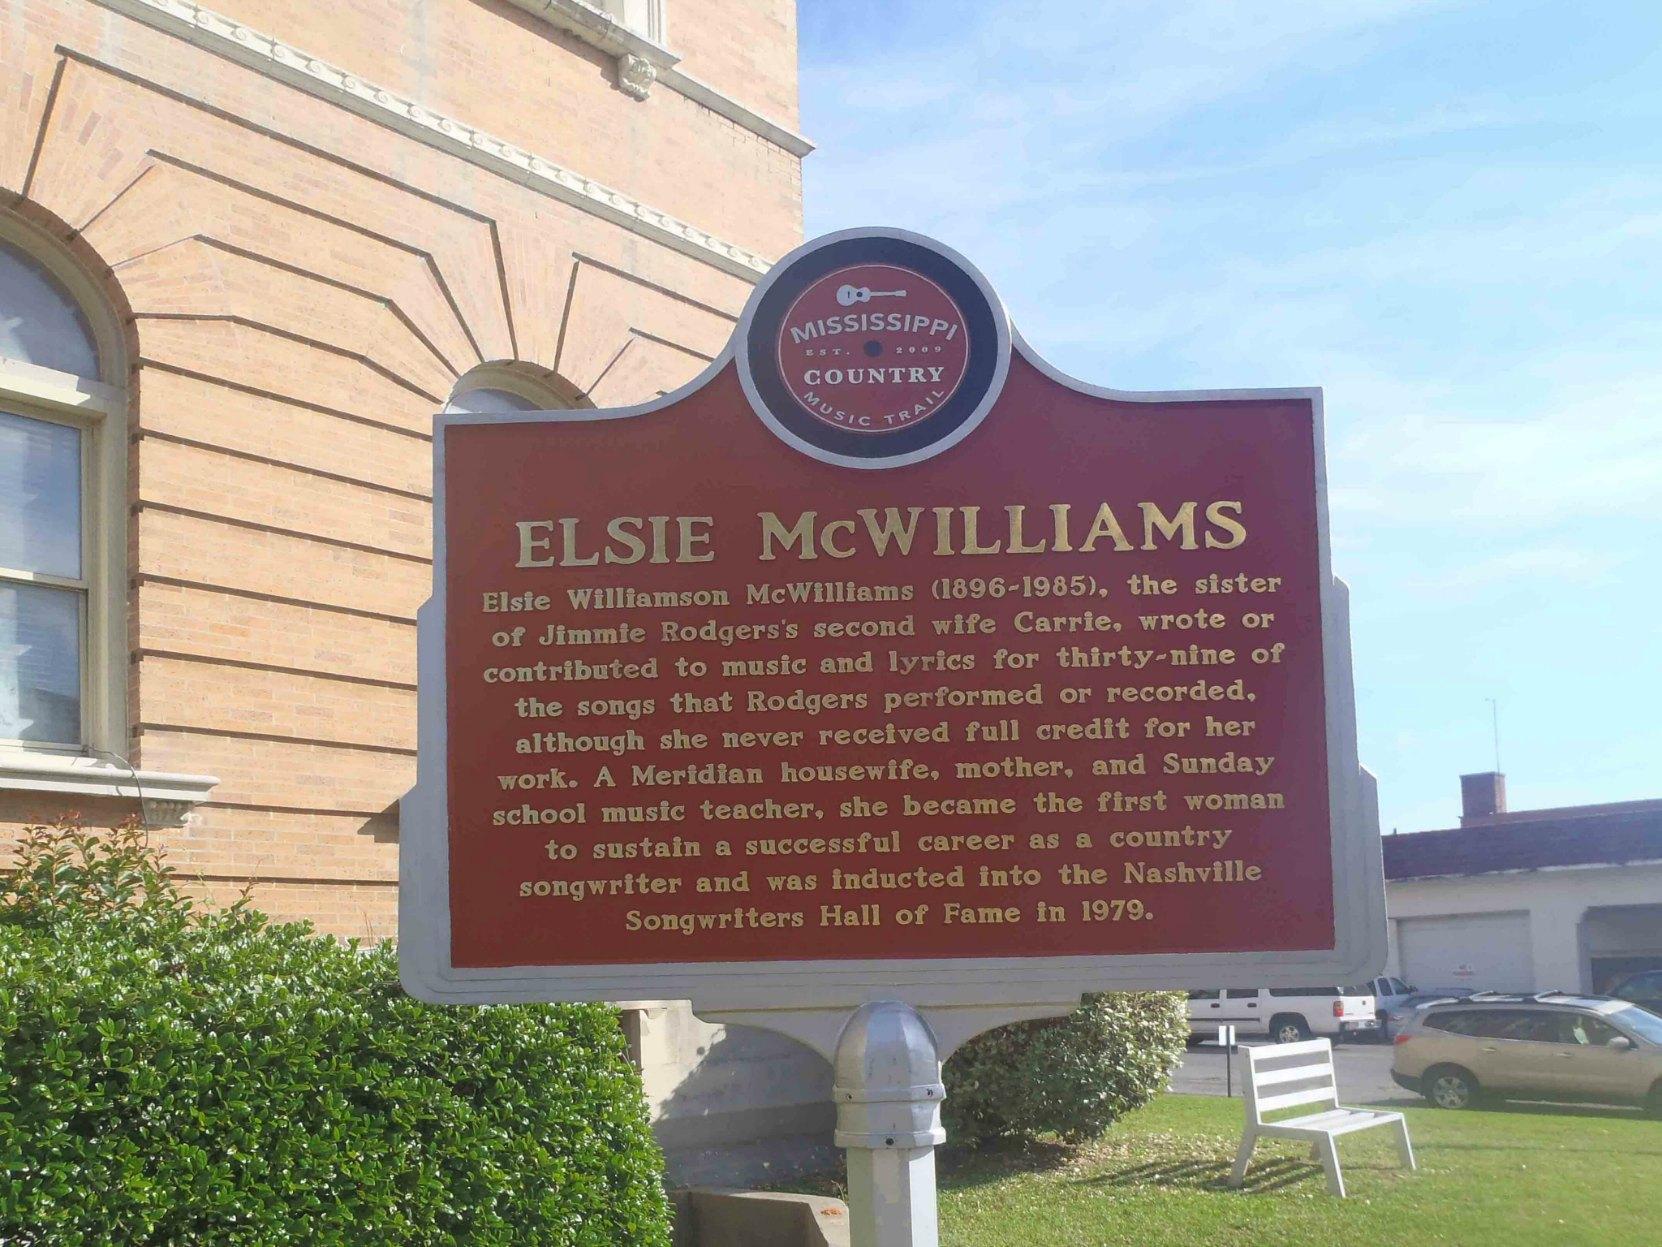 Mississippi Country Music Trail marker commemorating Elsie McWilliams, Meridian, Mississippi